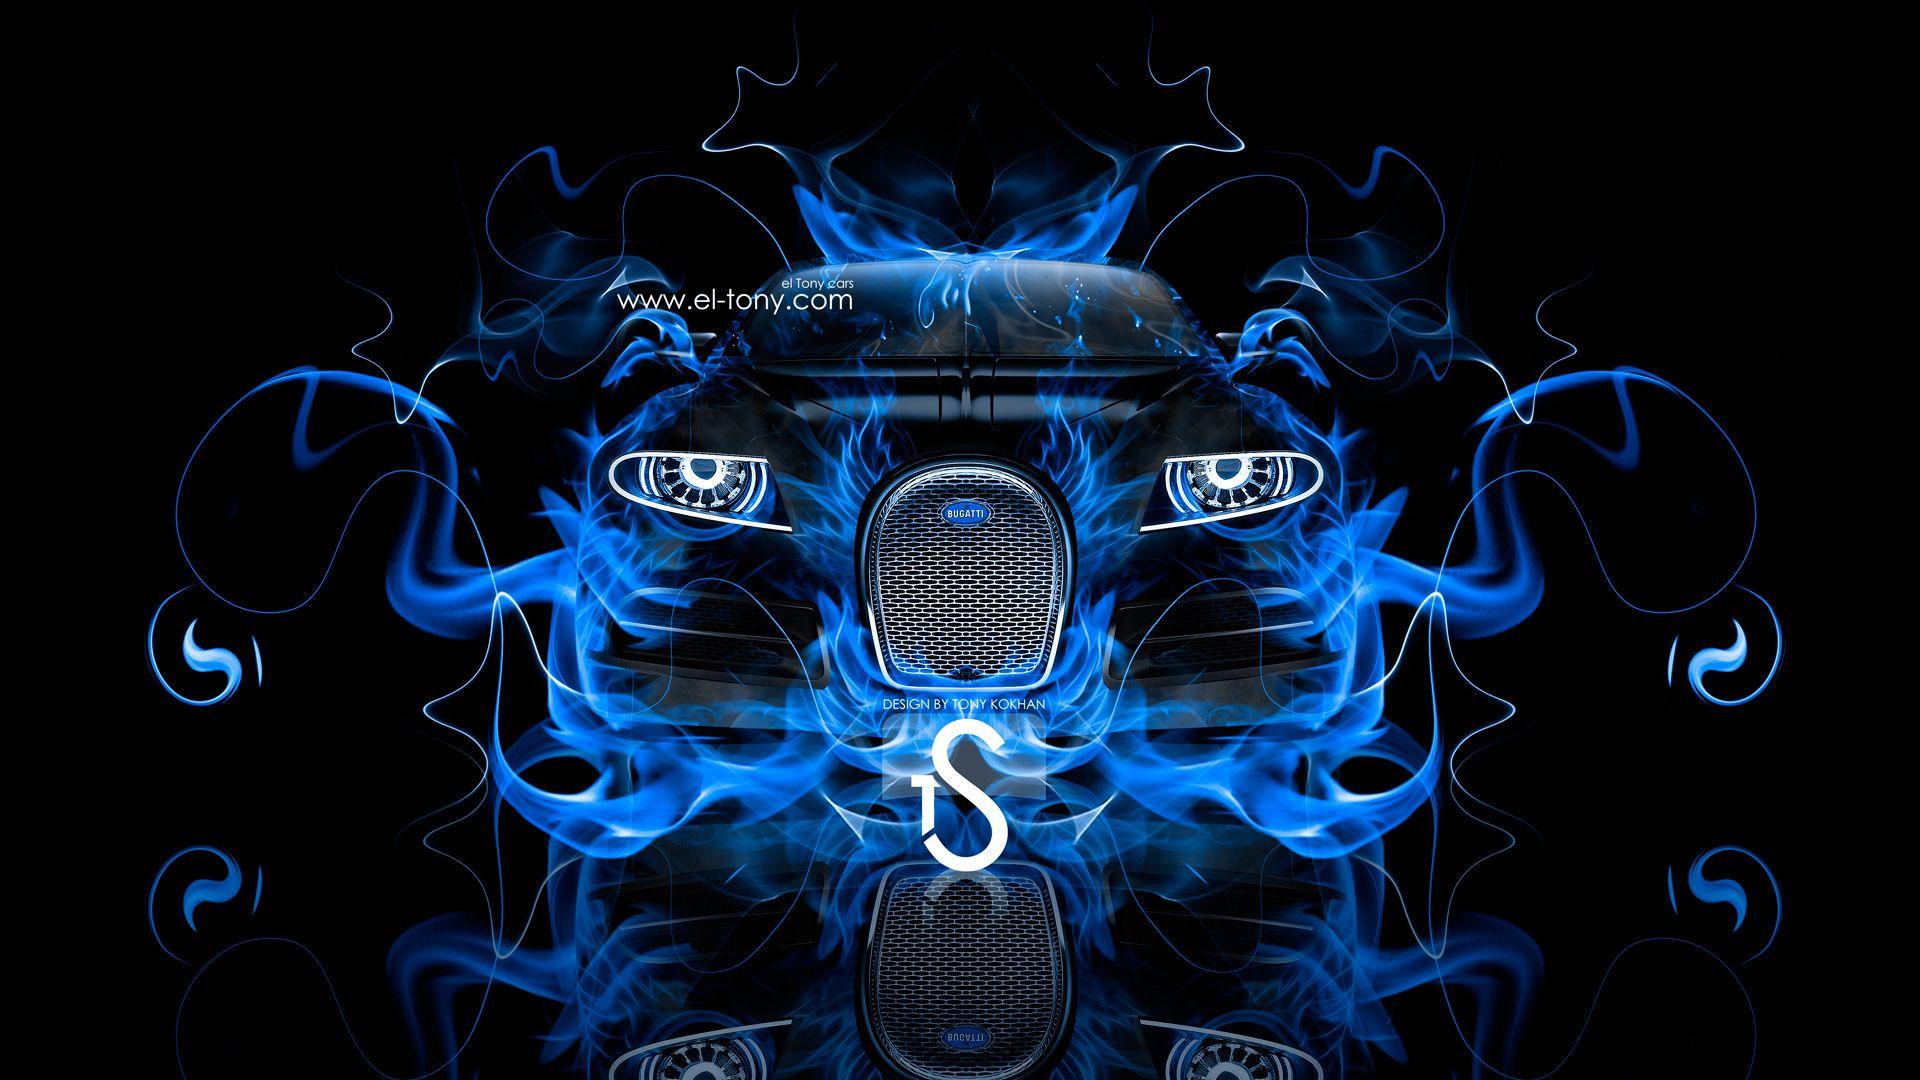 Gold Bugatti Veyron With Neon | Bugatti 16C Galibier Blue Fire Car 2013 HD Wallpapers Design By Tony  .